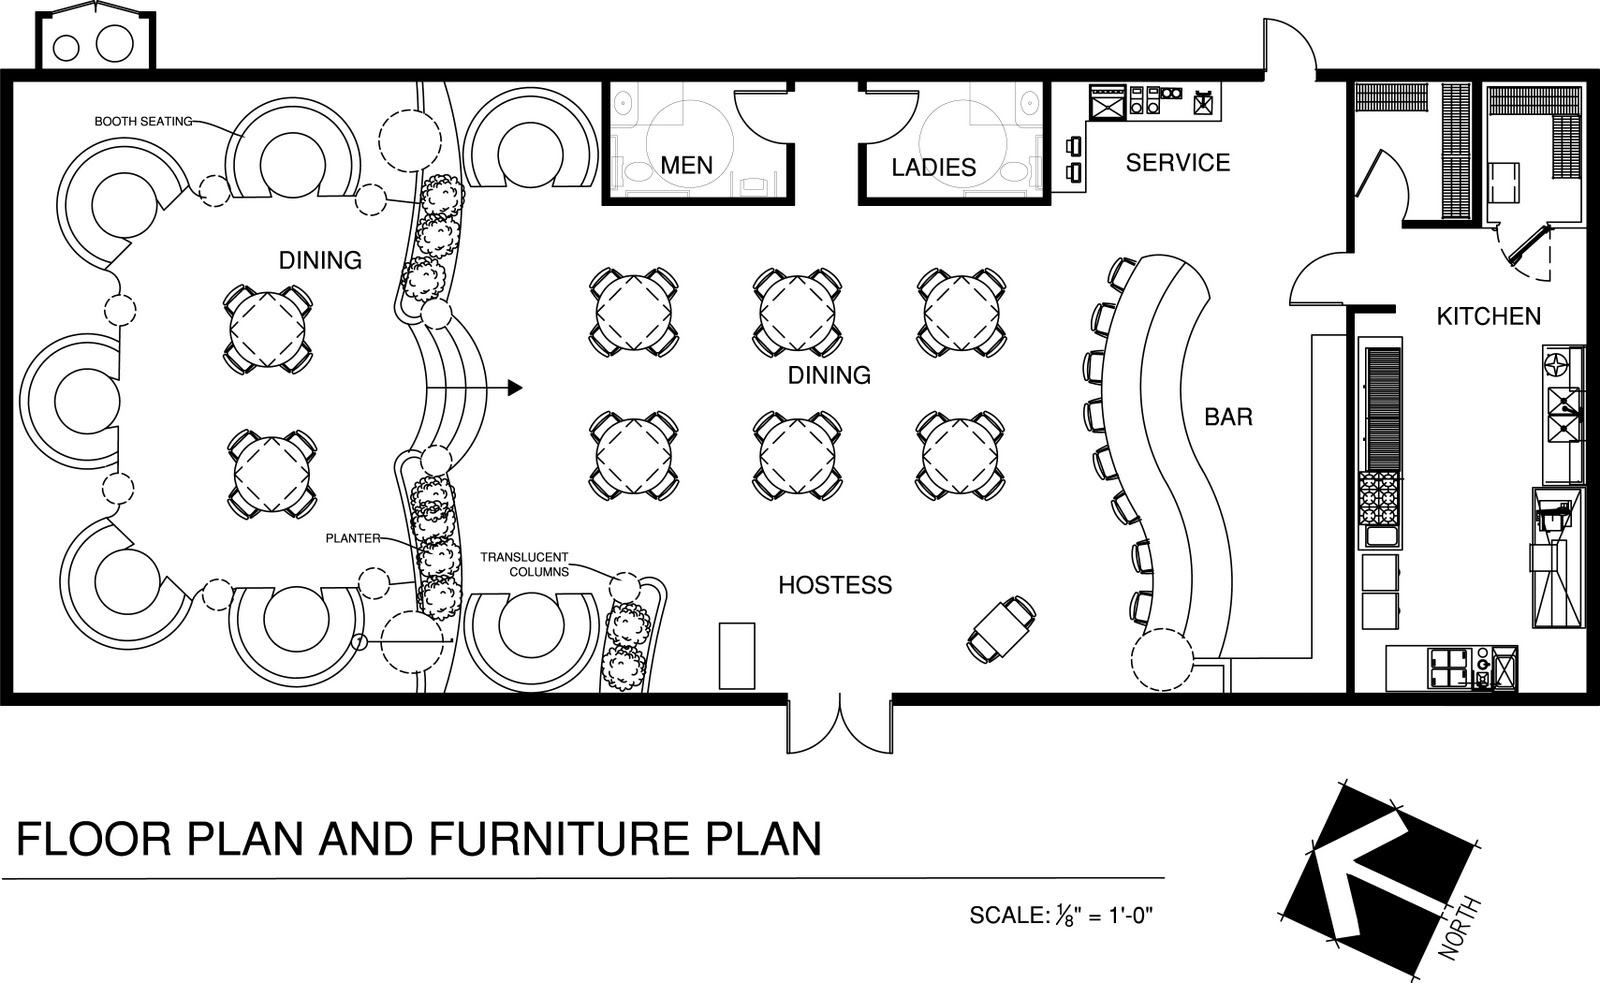 Designing A Restaurant Floor Plan  Home Design and Decor